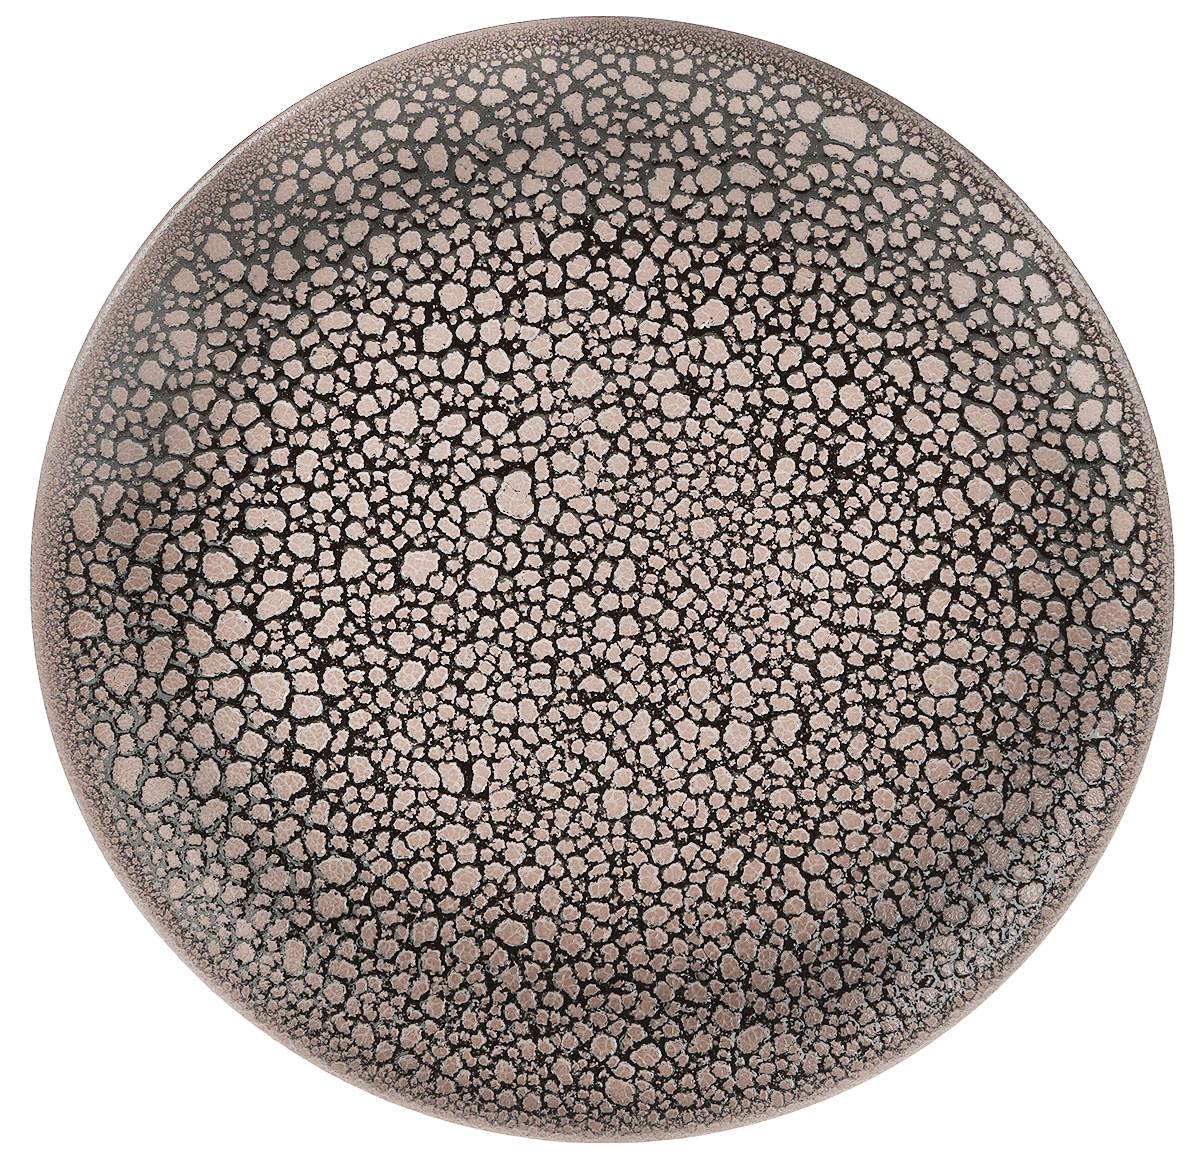 "Тарелка ""Борисовская керамика"", диаметр 22 см"